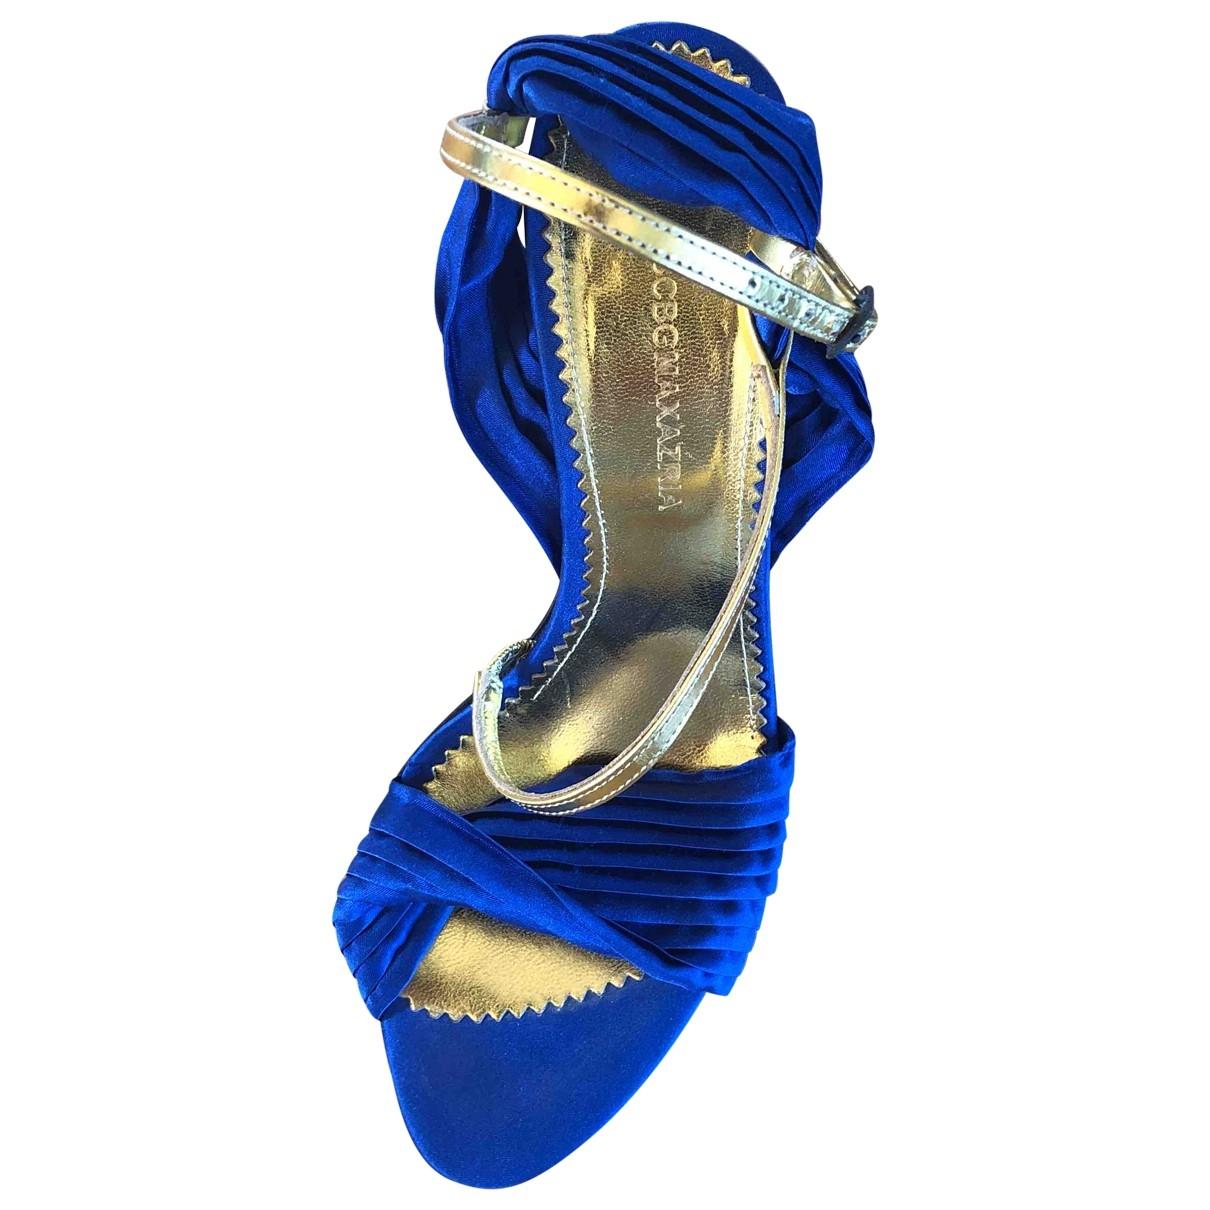 Bcbg Max Azria - Escarpins   pour femme en cuir - bleu